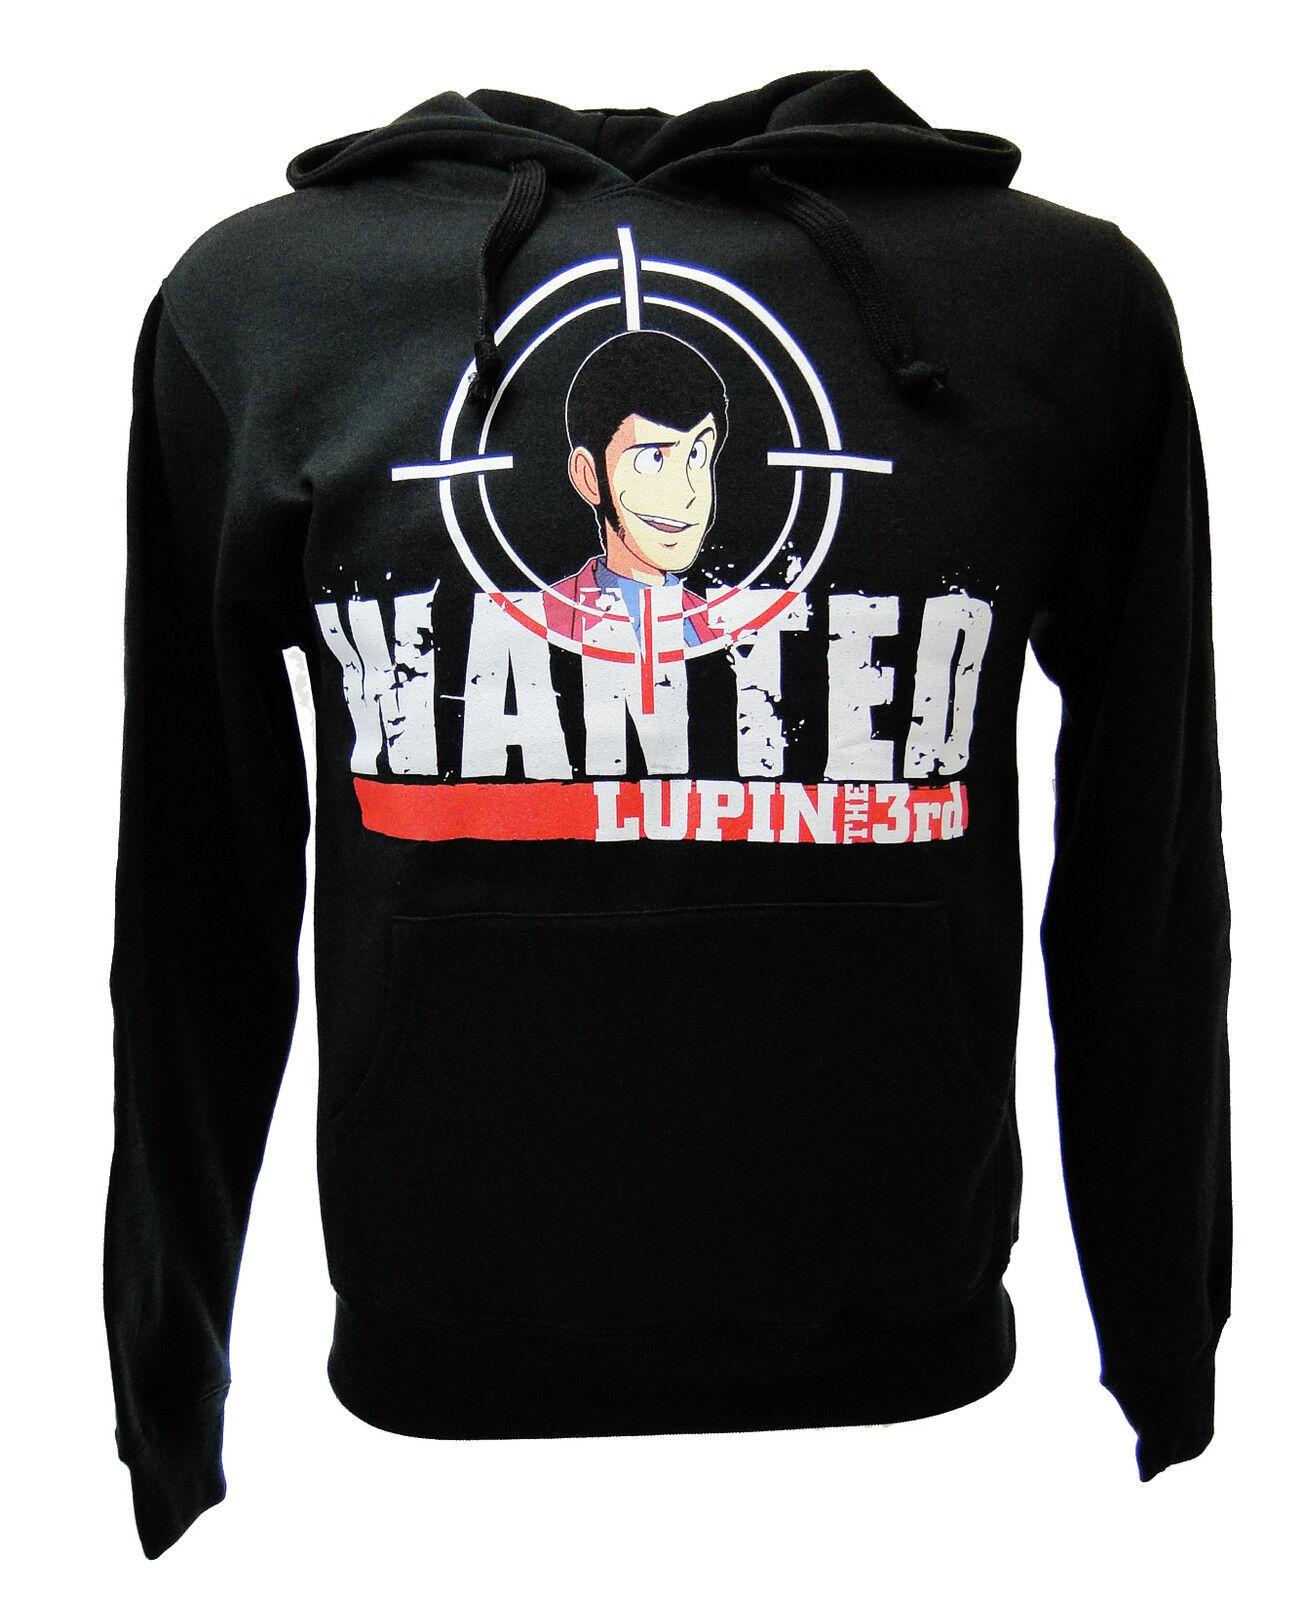 Felpa Lupin III Wanted Wanted Wanted Nera 991fd1